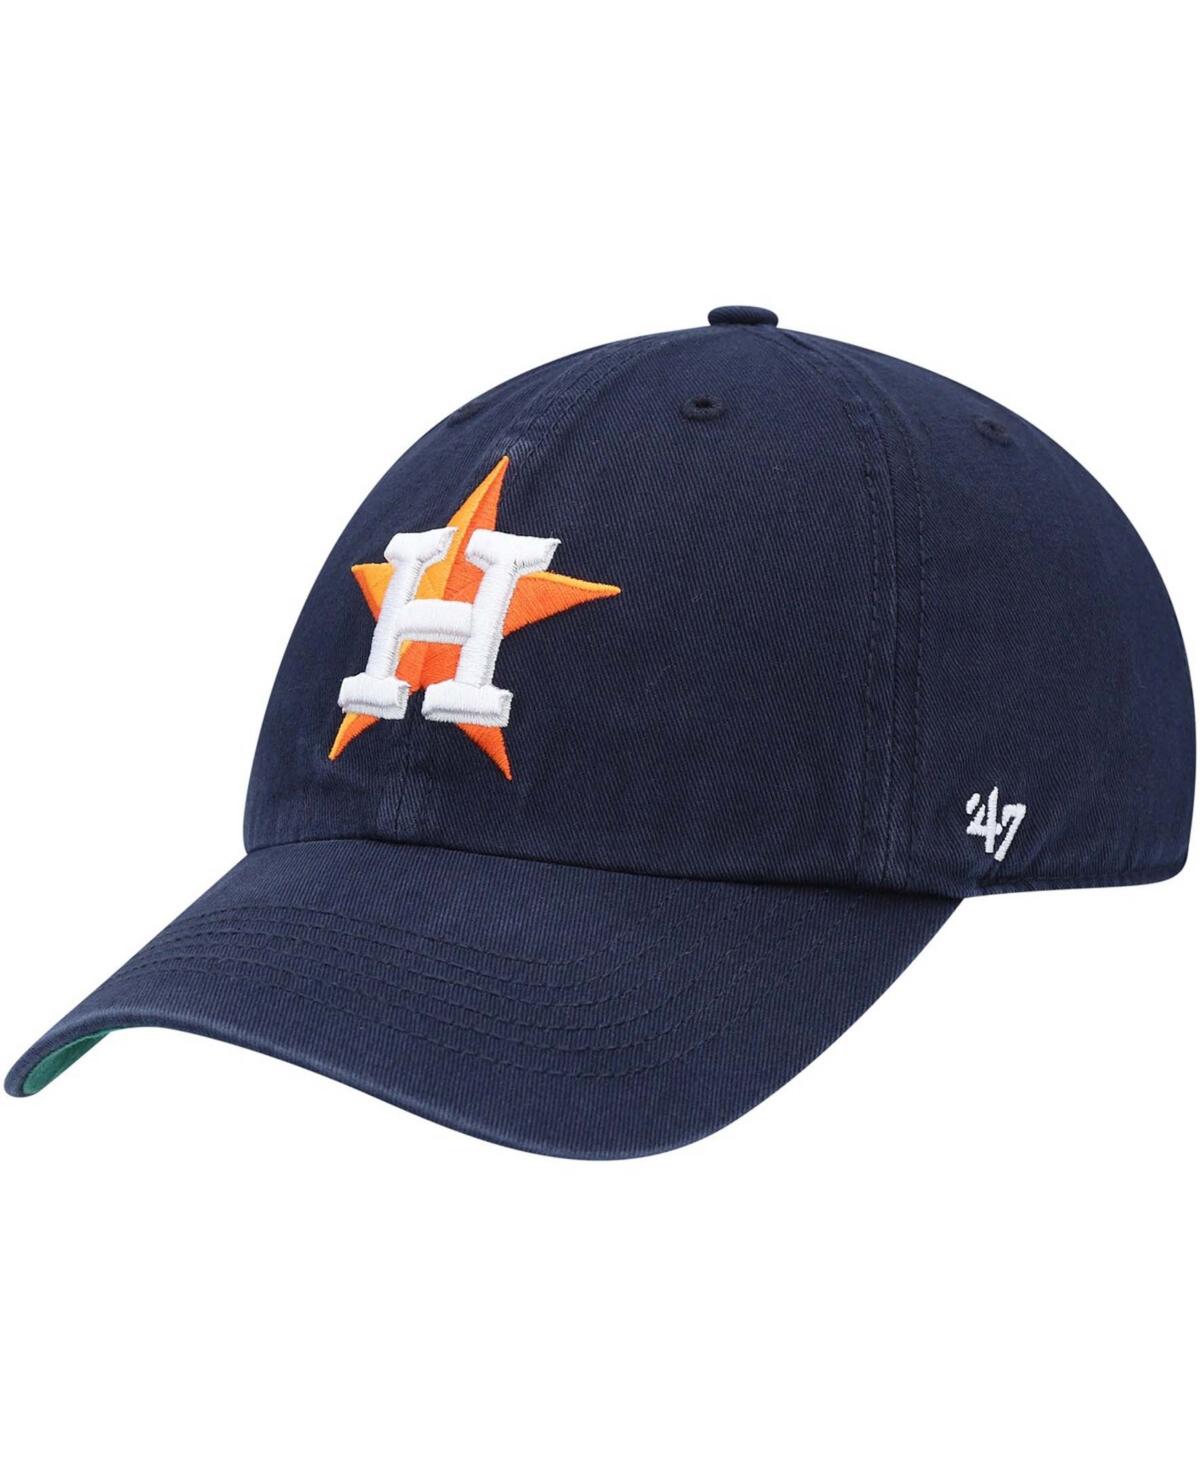 47 Brand Mens Houston Astros Team Franchise Fitted Cap